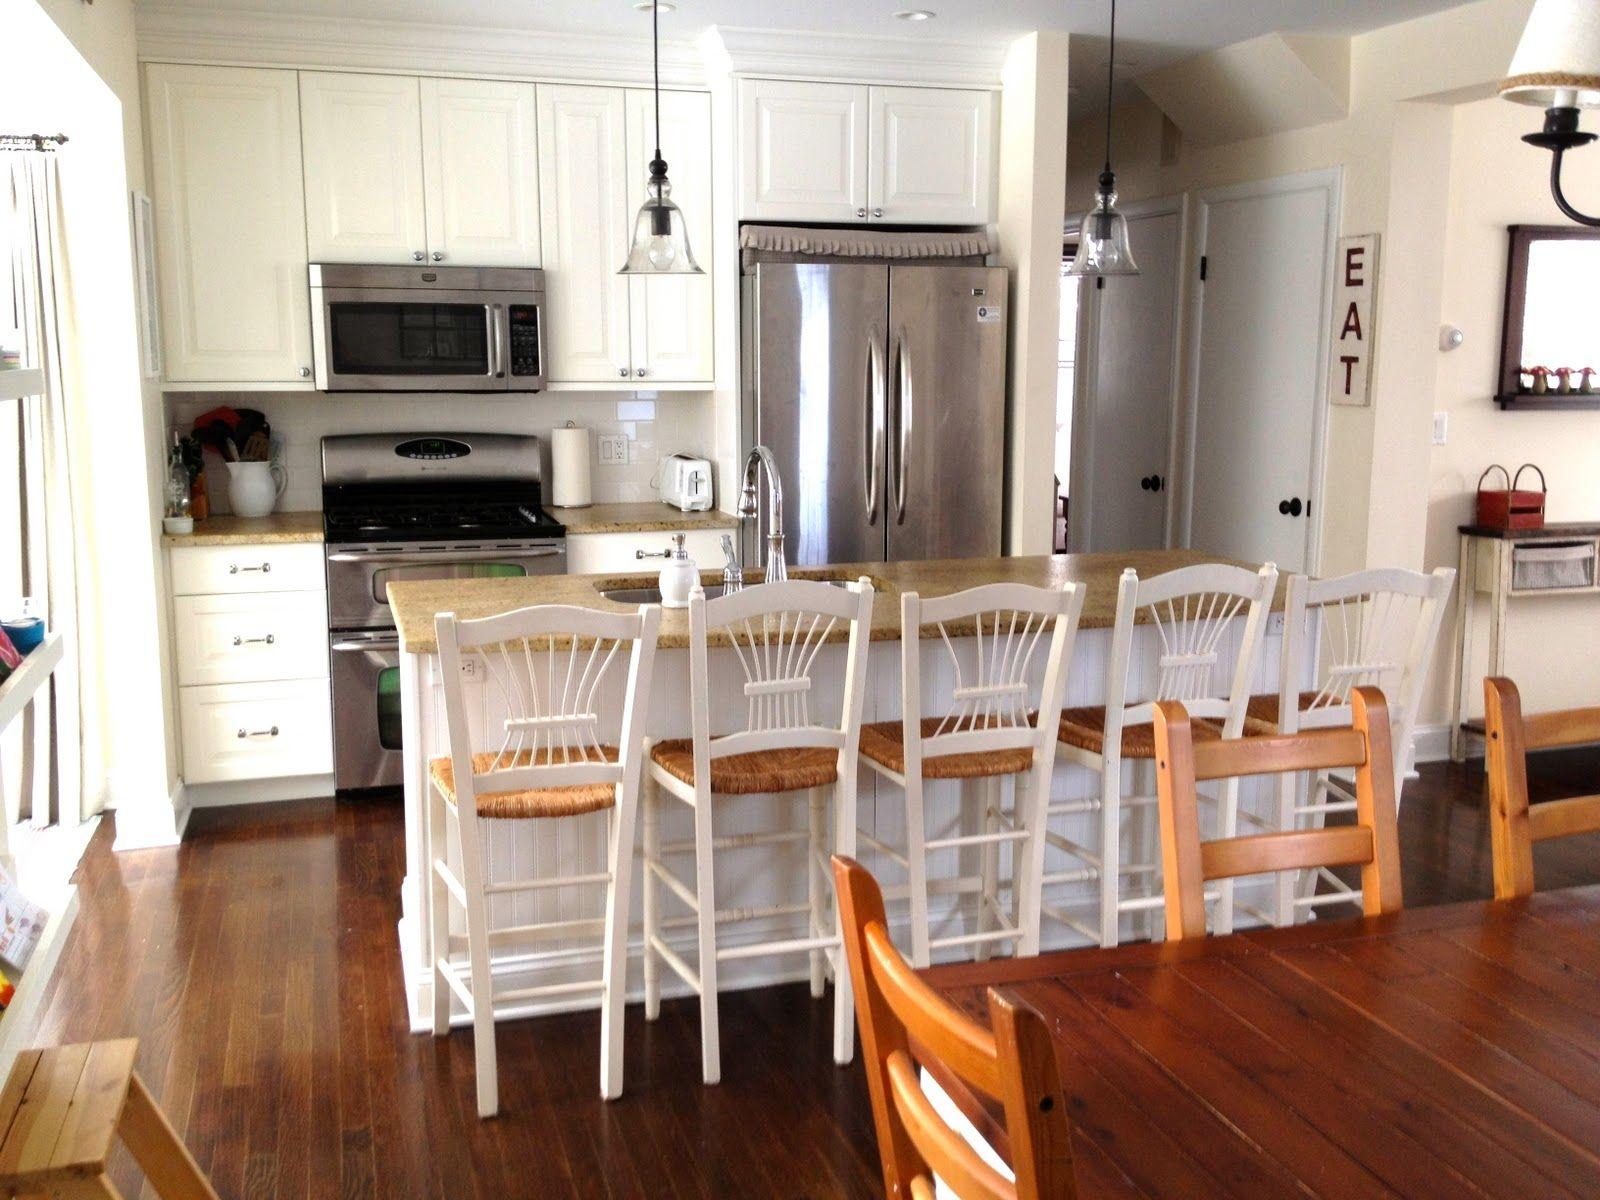 Single Wall Kitchen Layout With Kitchen Sink Island Via